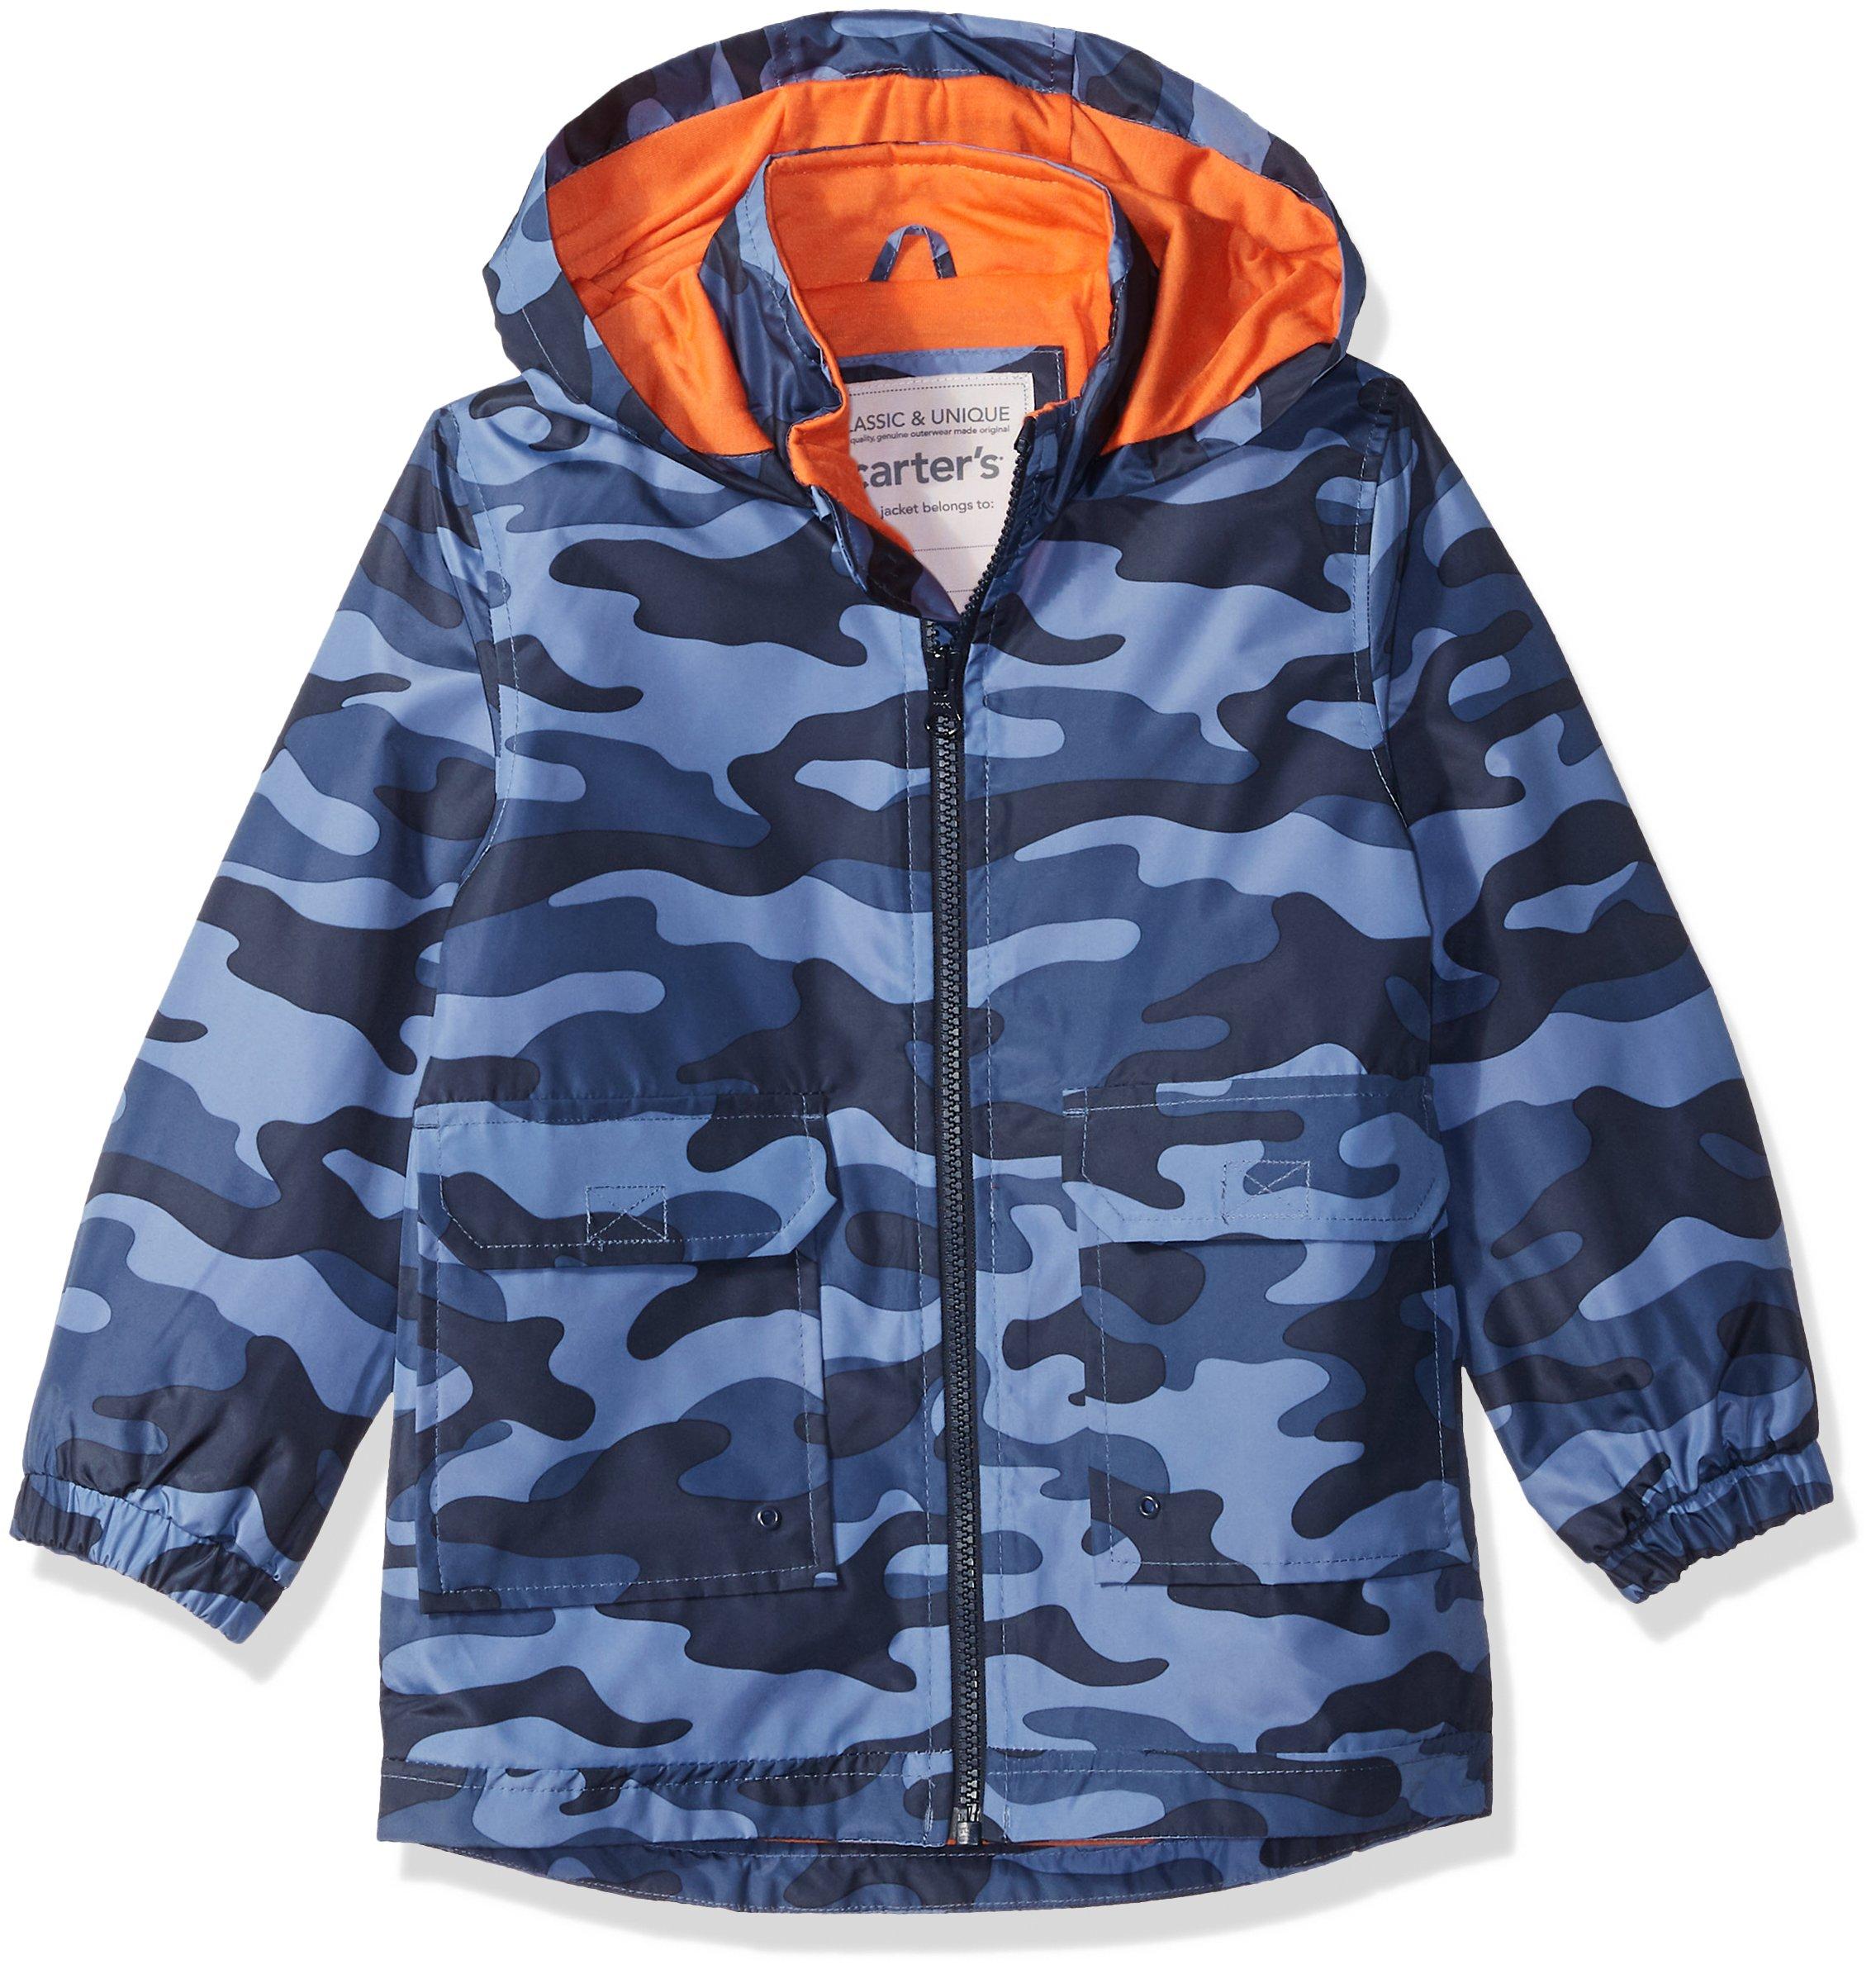 393ca2dcbf205 Best Rated in Boys' Outdoor Recreation Jackets & Coats & Helpful ...